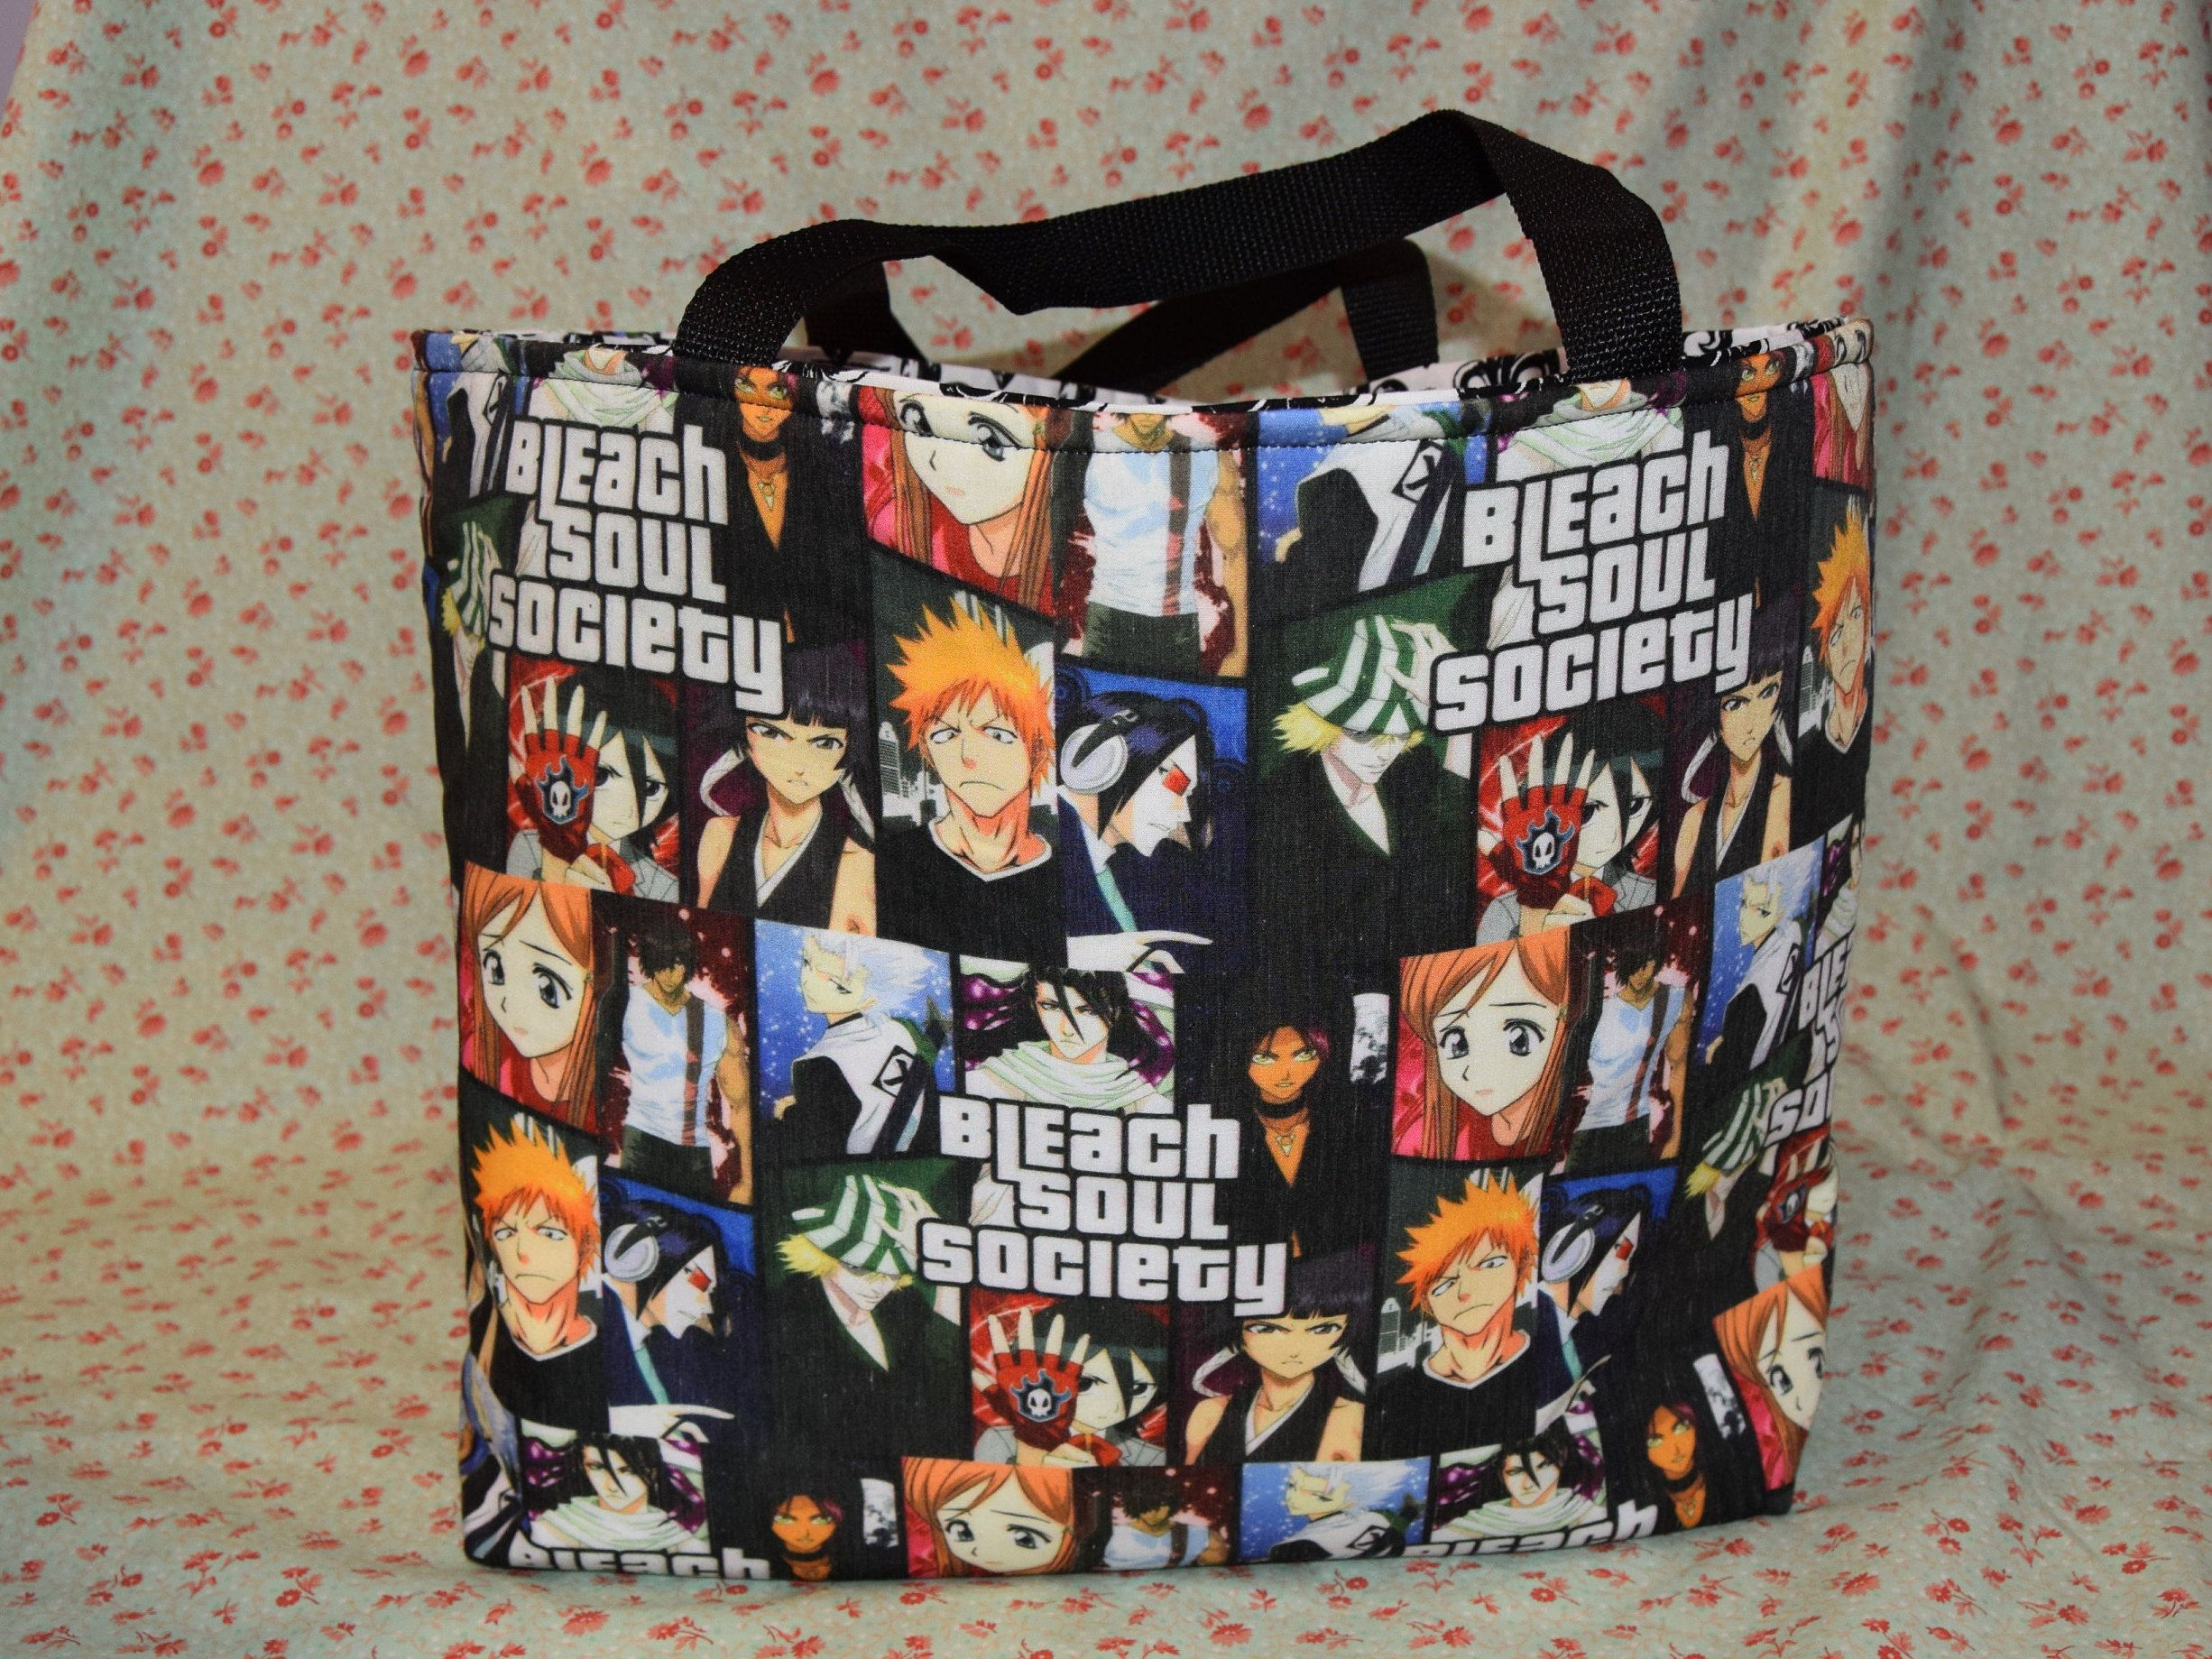 Bleach soul society animemanga themed tote bag perfect